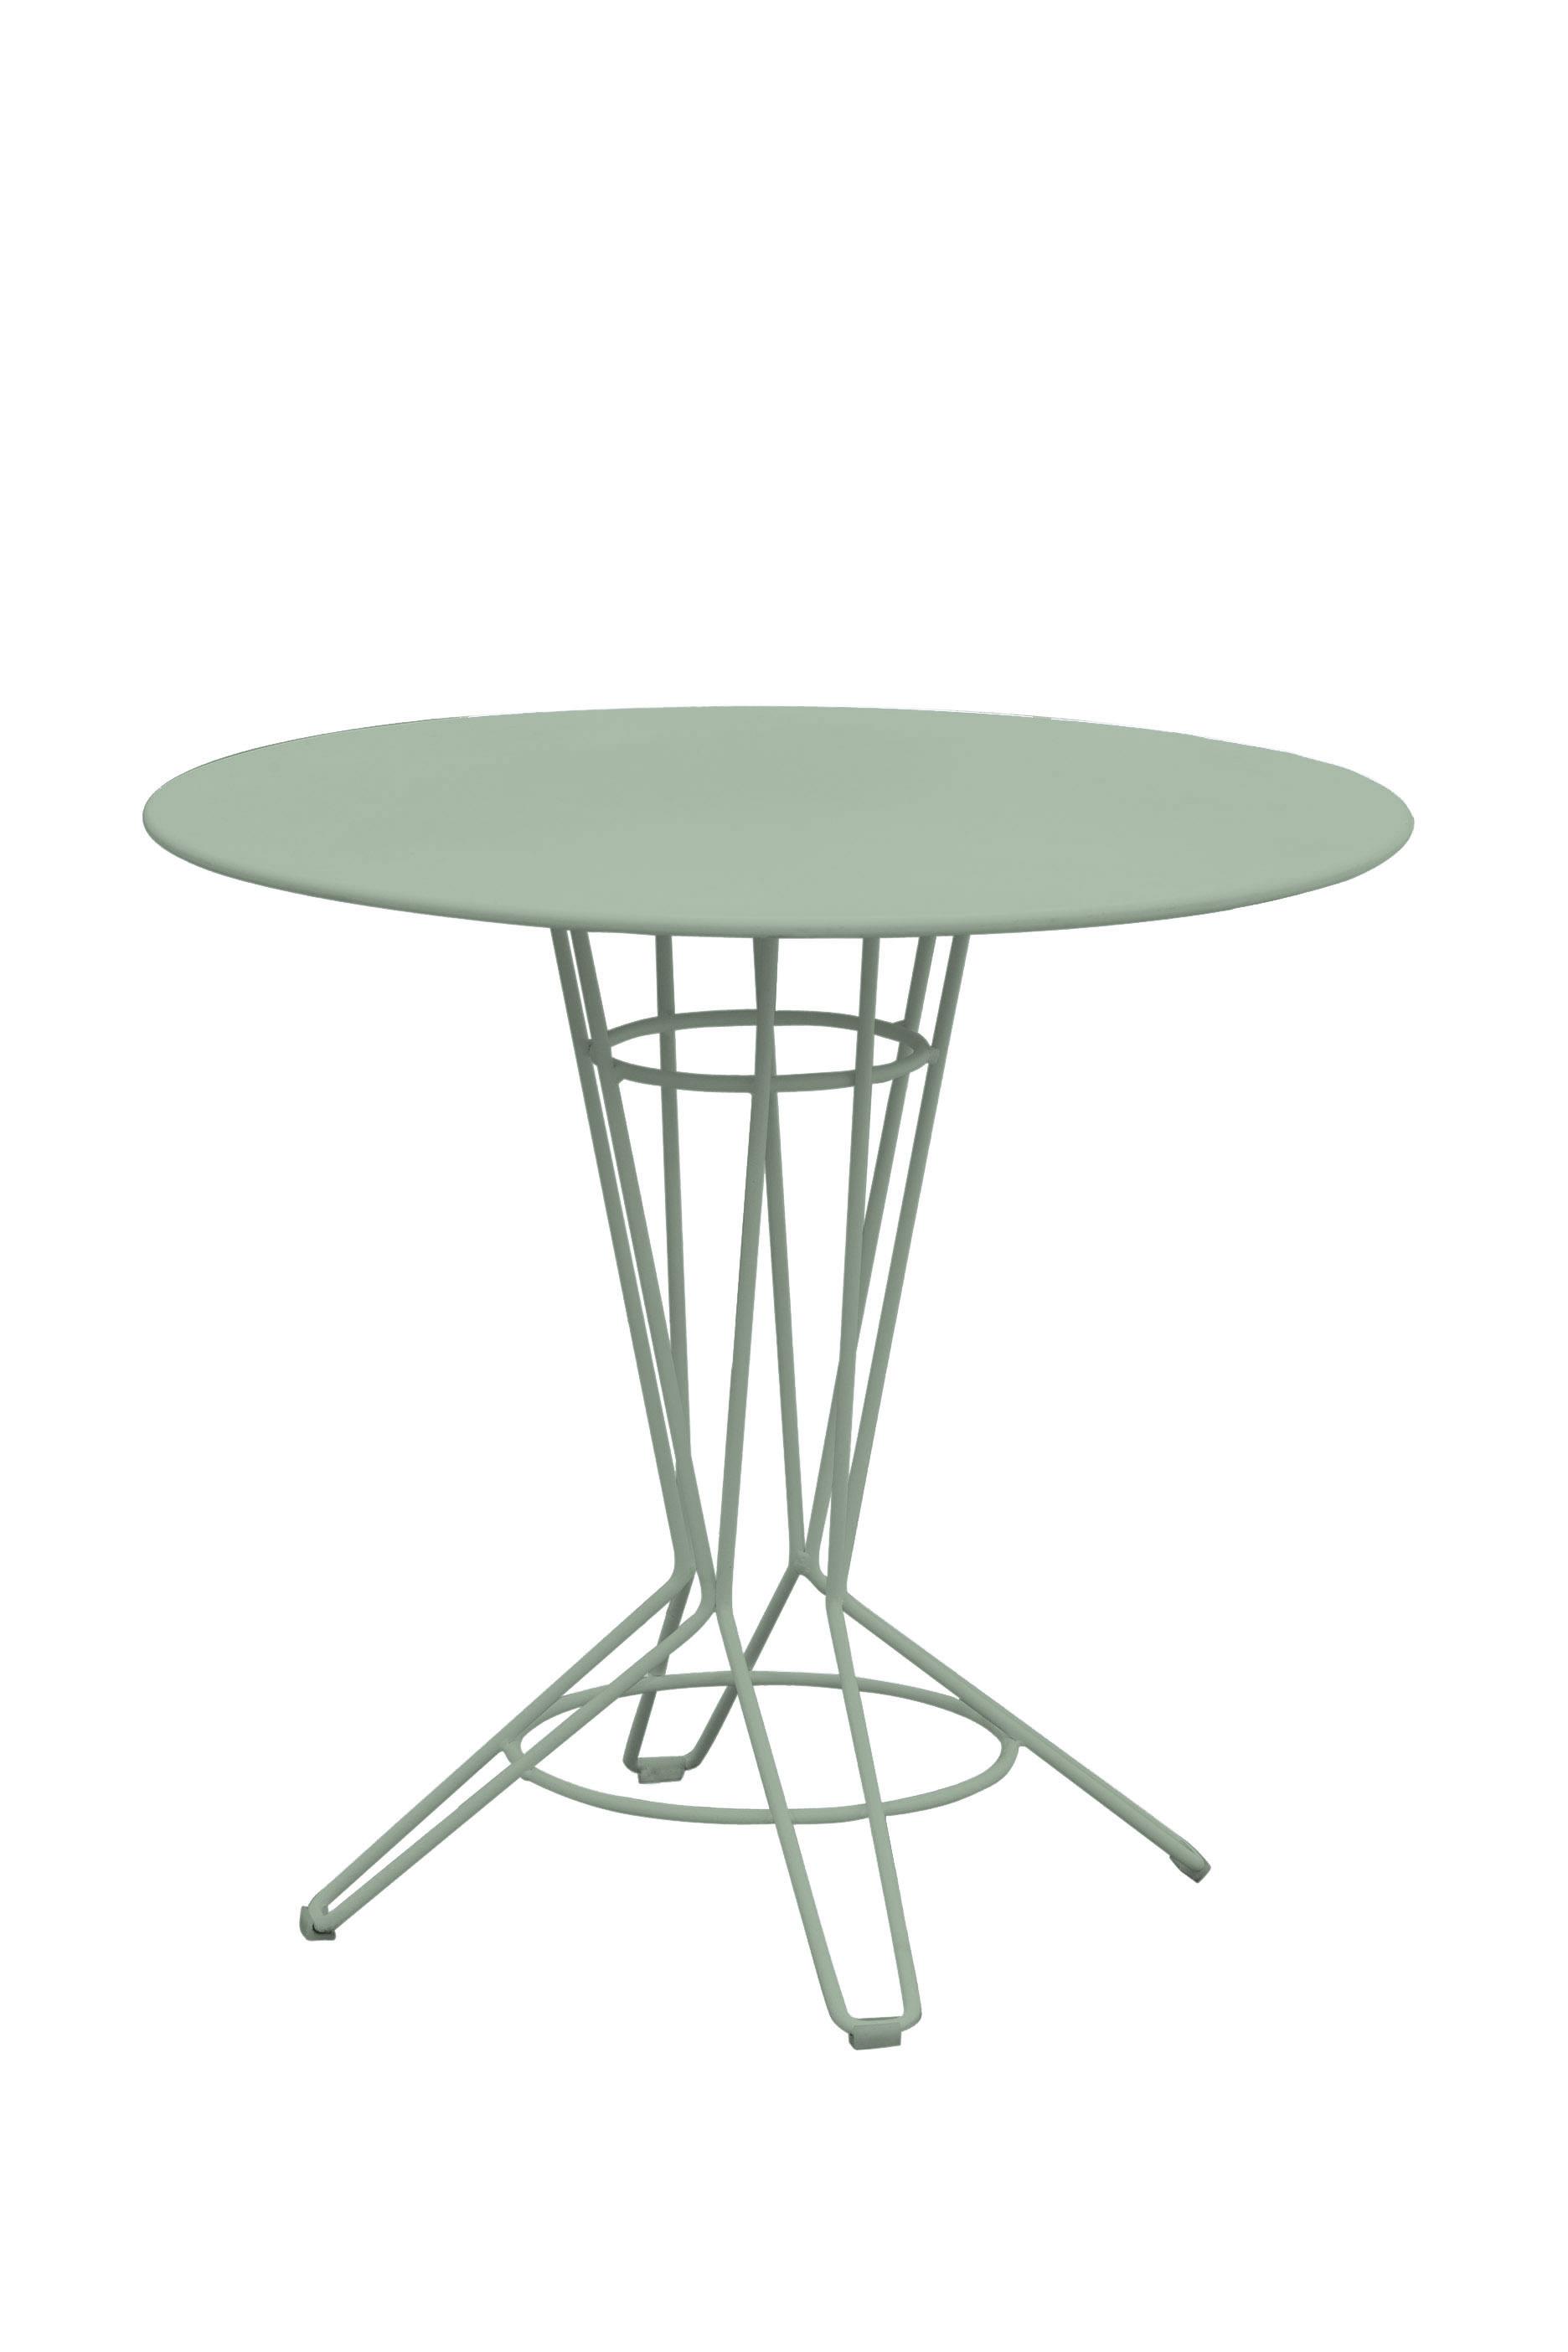 NOSTRUM - Table rond en acier vert pastel D80